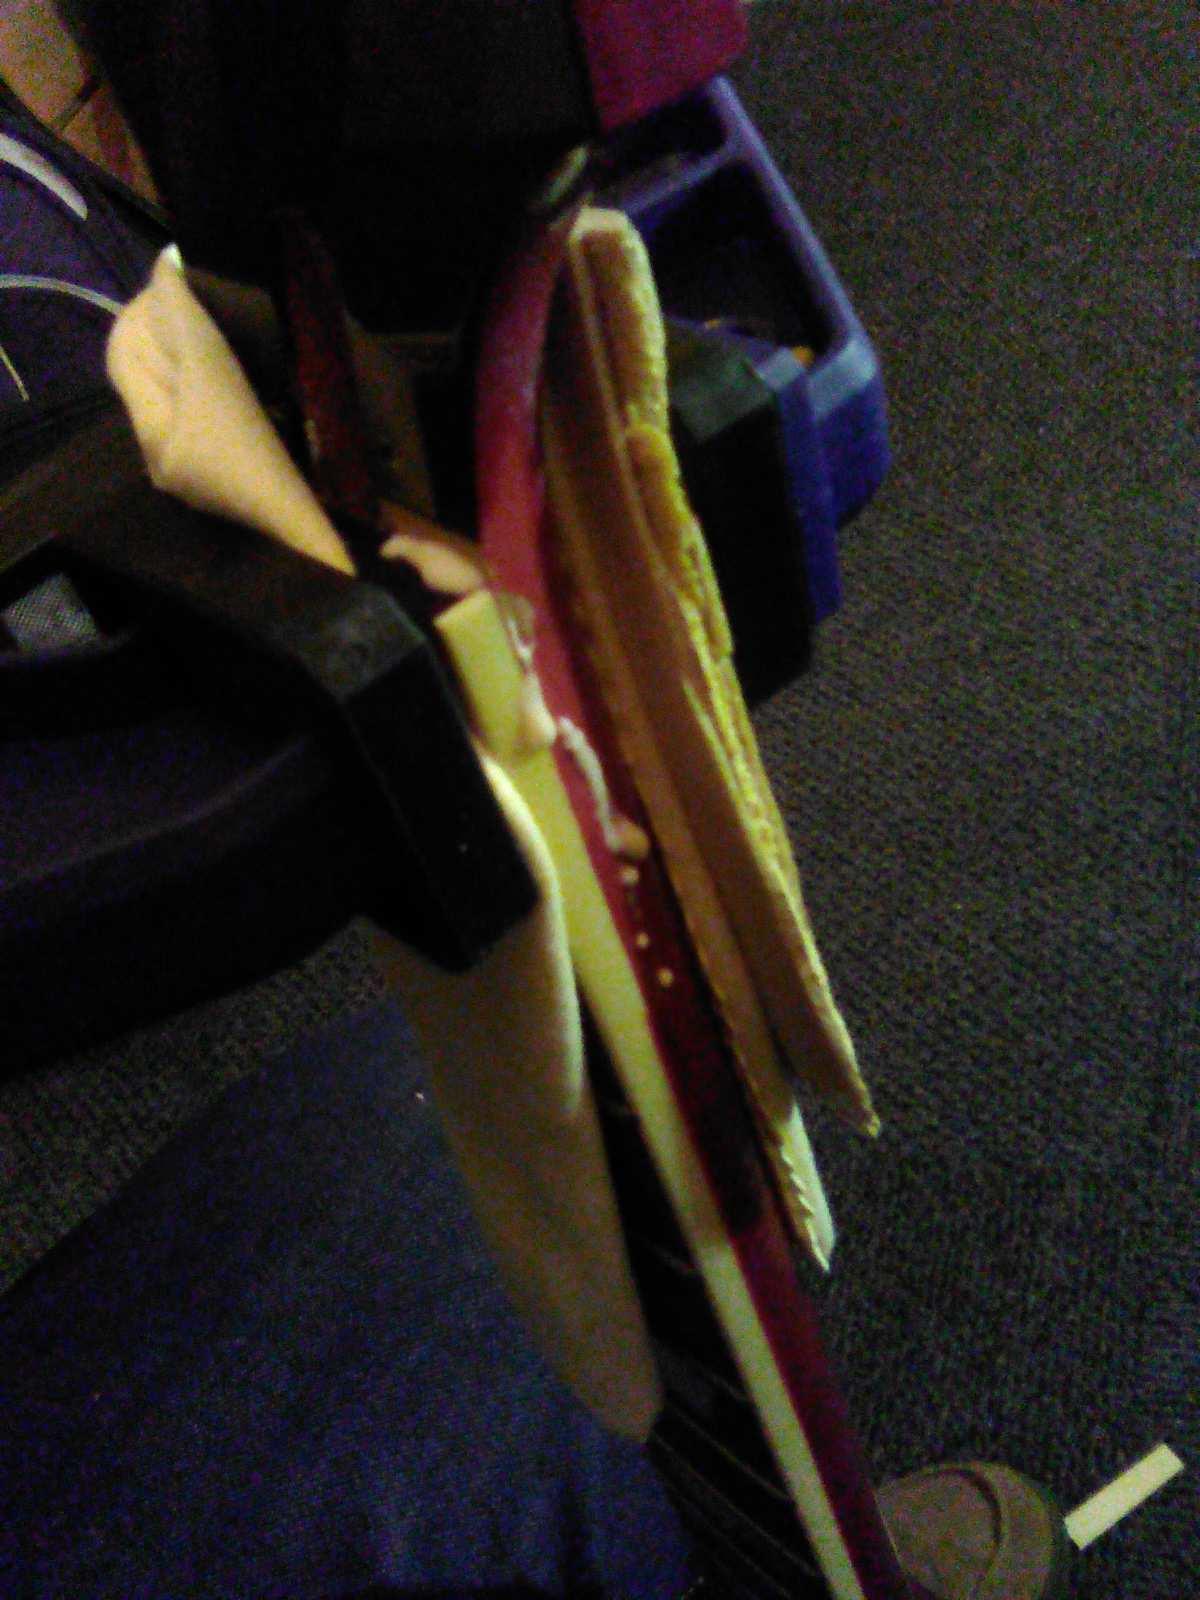 Respraying finish cracks in beater guitar-c4-jpg